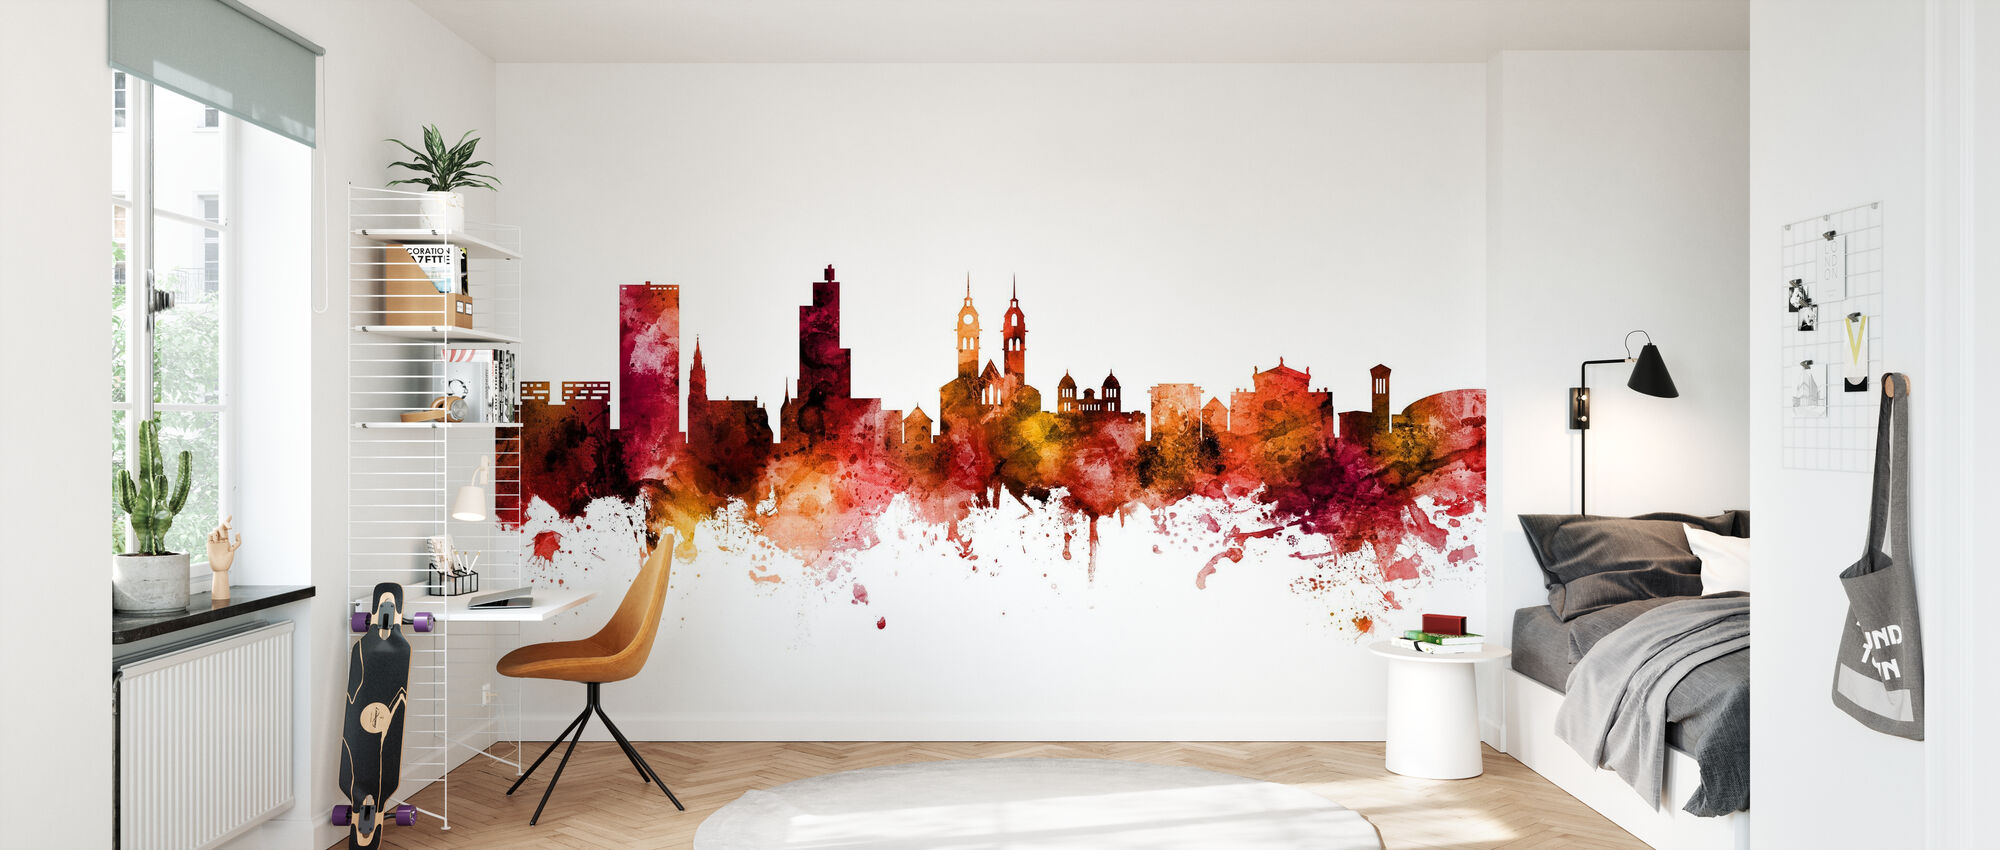 Winterthur Switzerland Skyline - Wallpaper - Kids Room